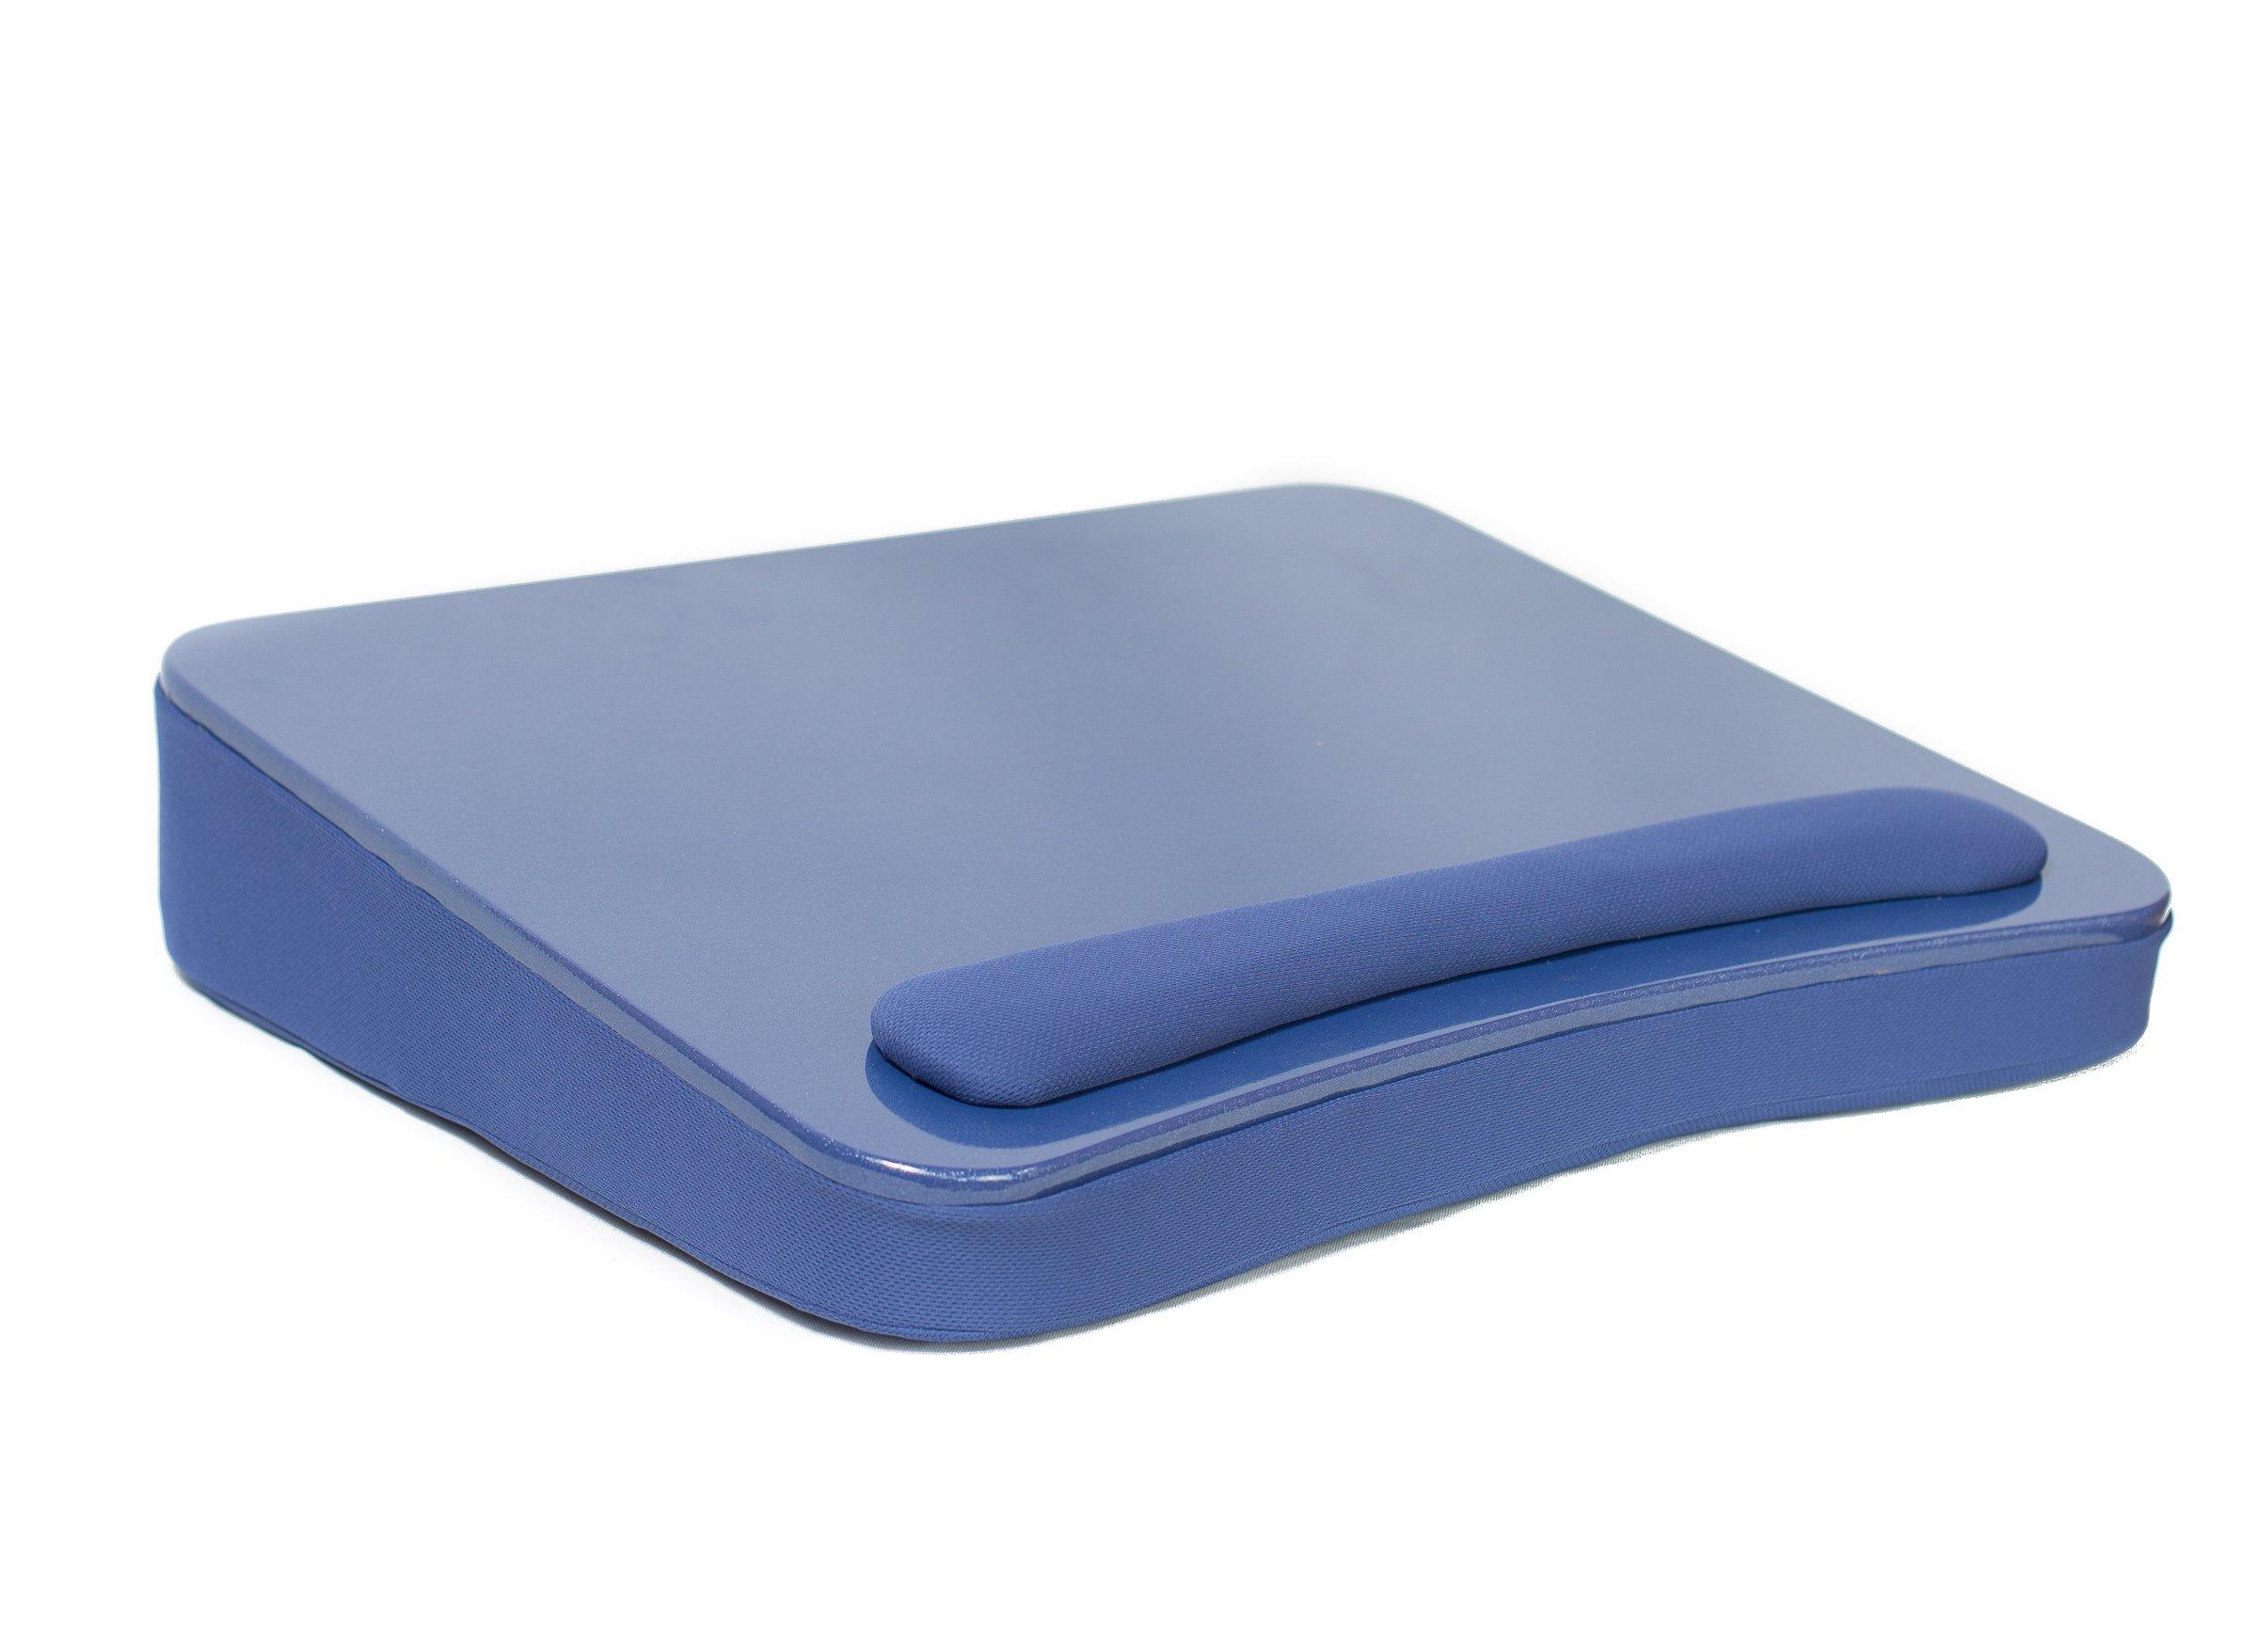 Sofia + Sam All-Purpose Lap Desk Color: Blue